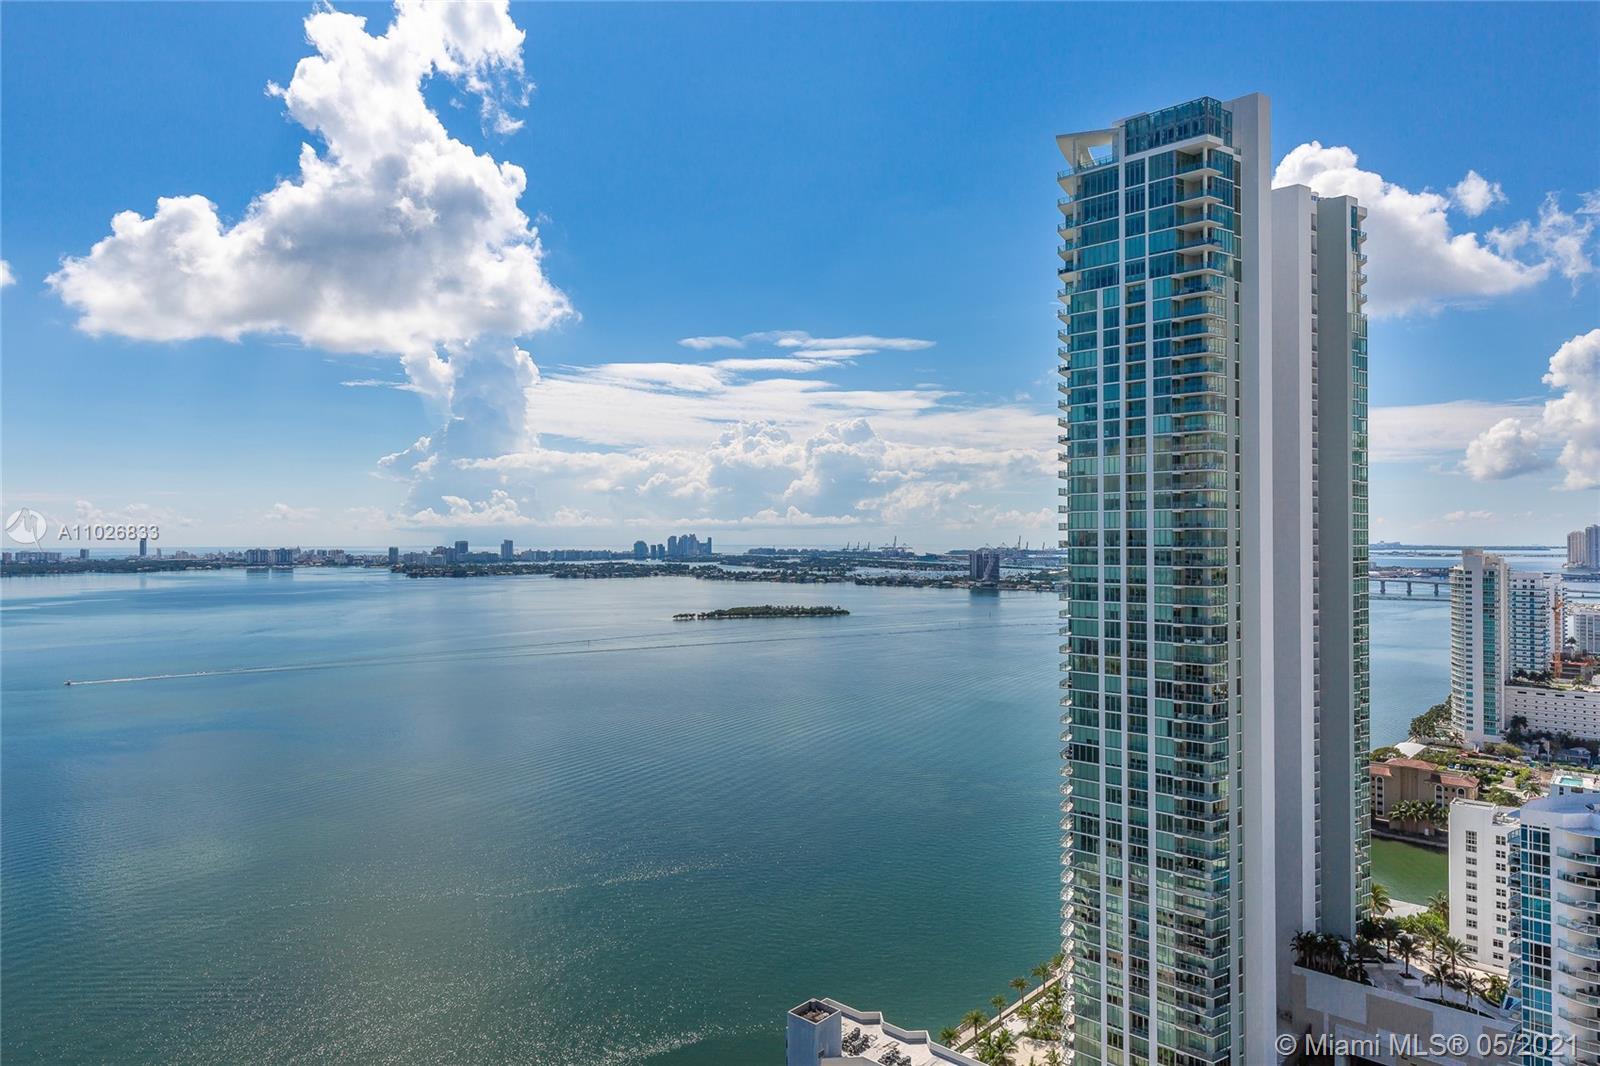 Paraiso Bay #3501 - 650 NE 32 St #3501, Miami, FL 33137